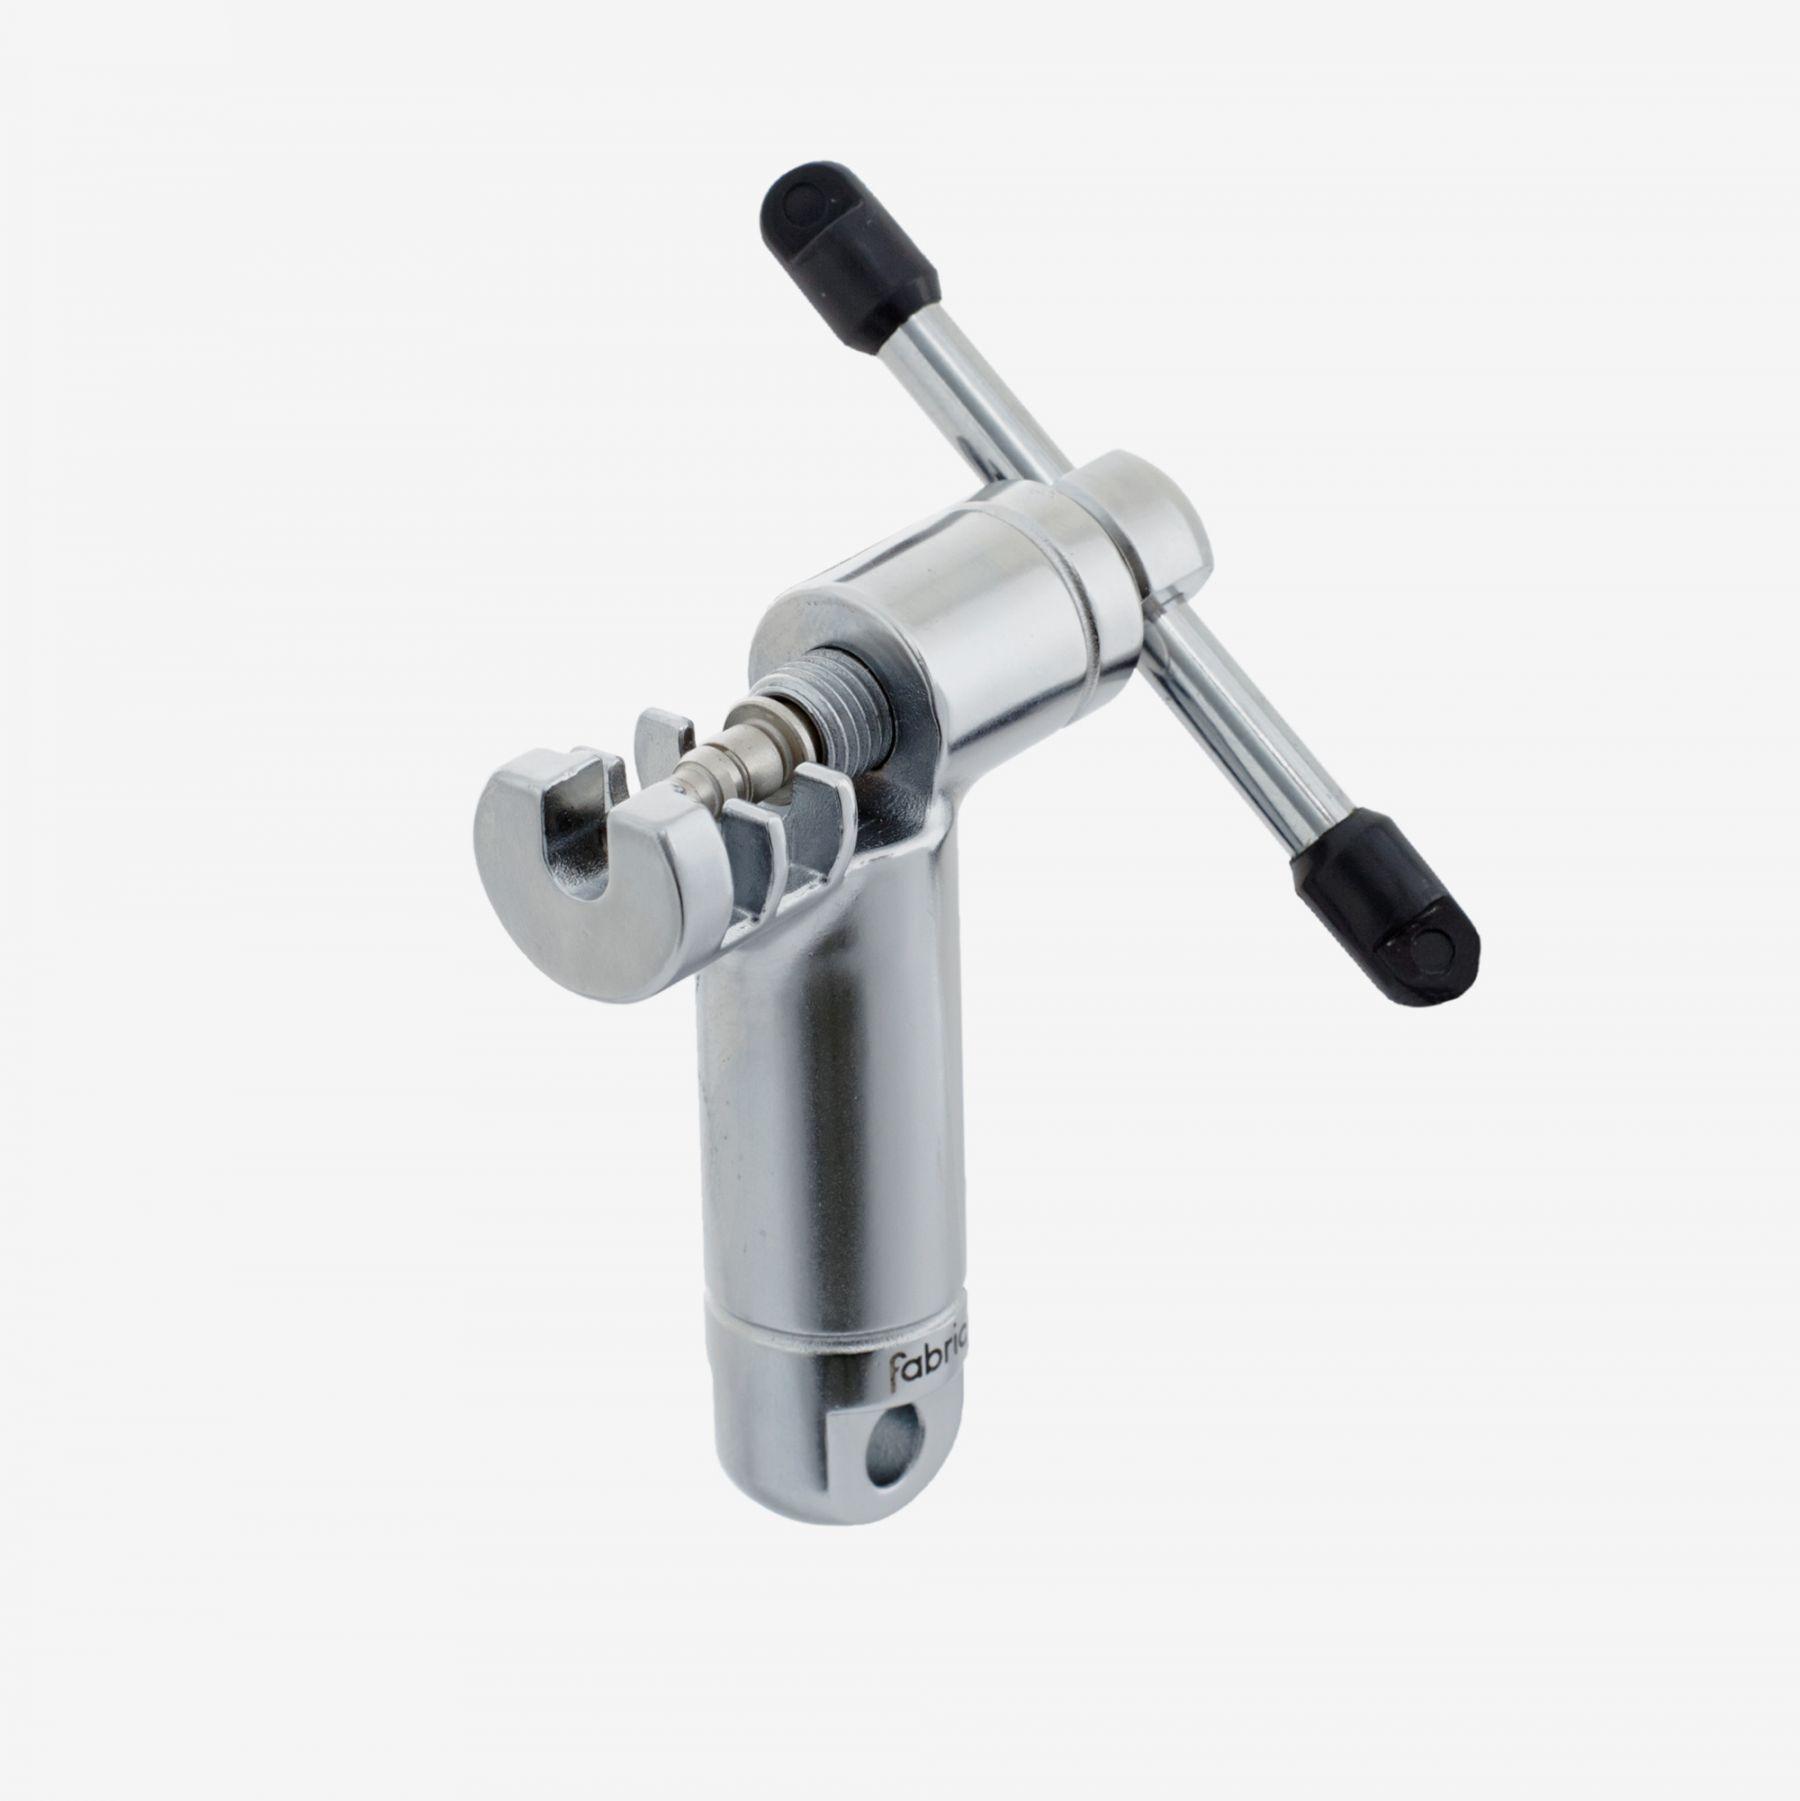 Fabric kædeadskiller mini tool - FP9207U60OS | Chain Tool